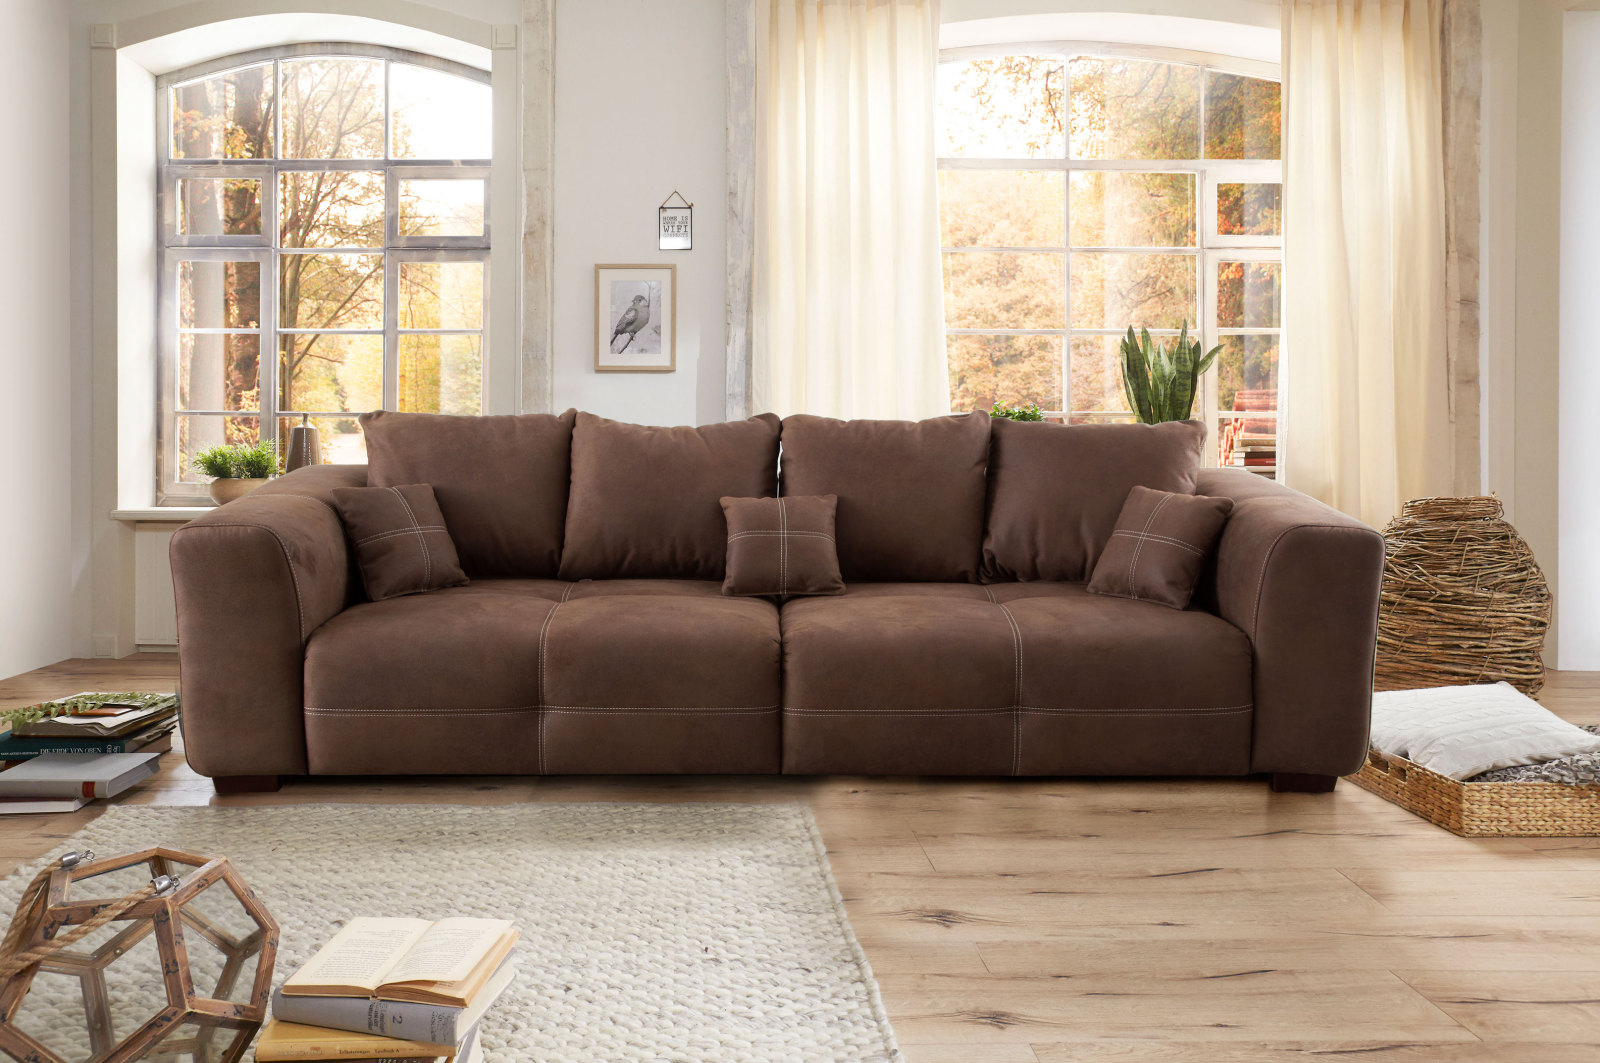 Full Size of Big Sofa Sam Roller Couch Grau Kolonialstil Bei Arizona Toronto L Form Rot Braun Microfaser Online Kaufen Günstig Büffelleder Xxl Kunstleder Großes Cassina Wohnzimmer Big Sofa Roller